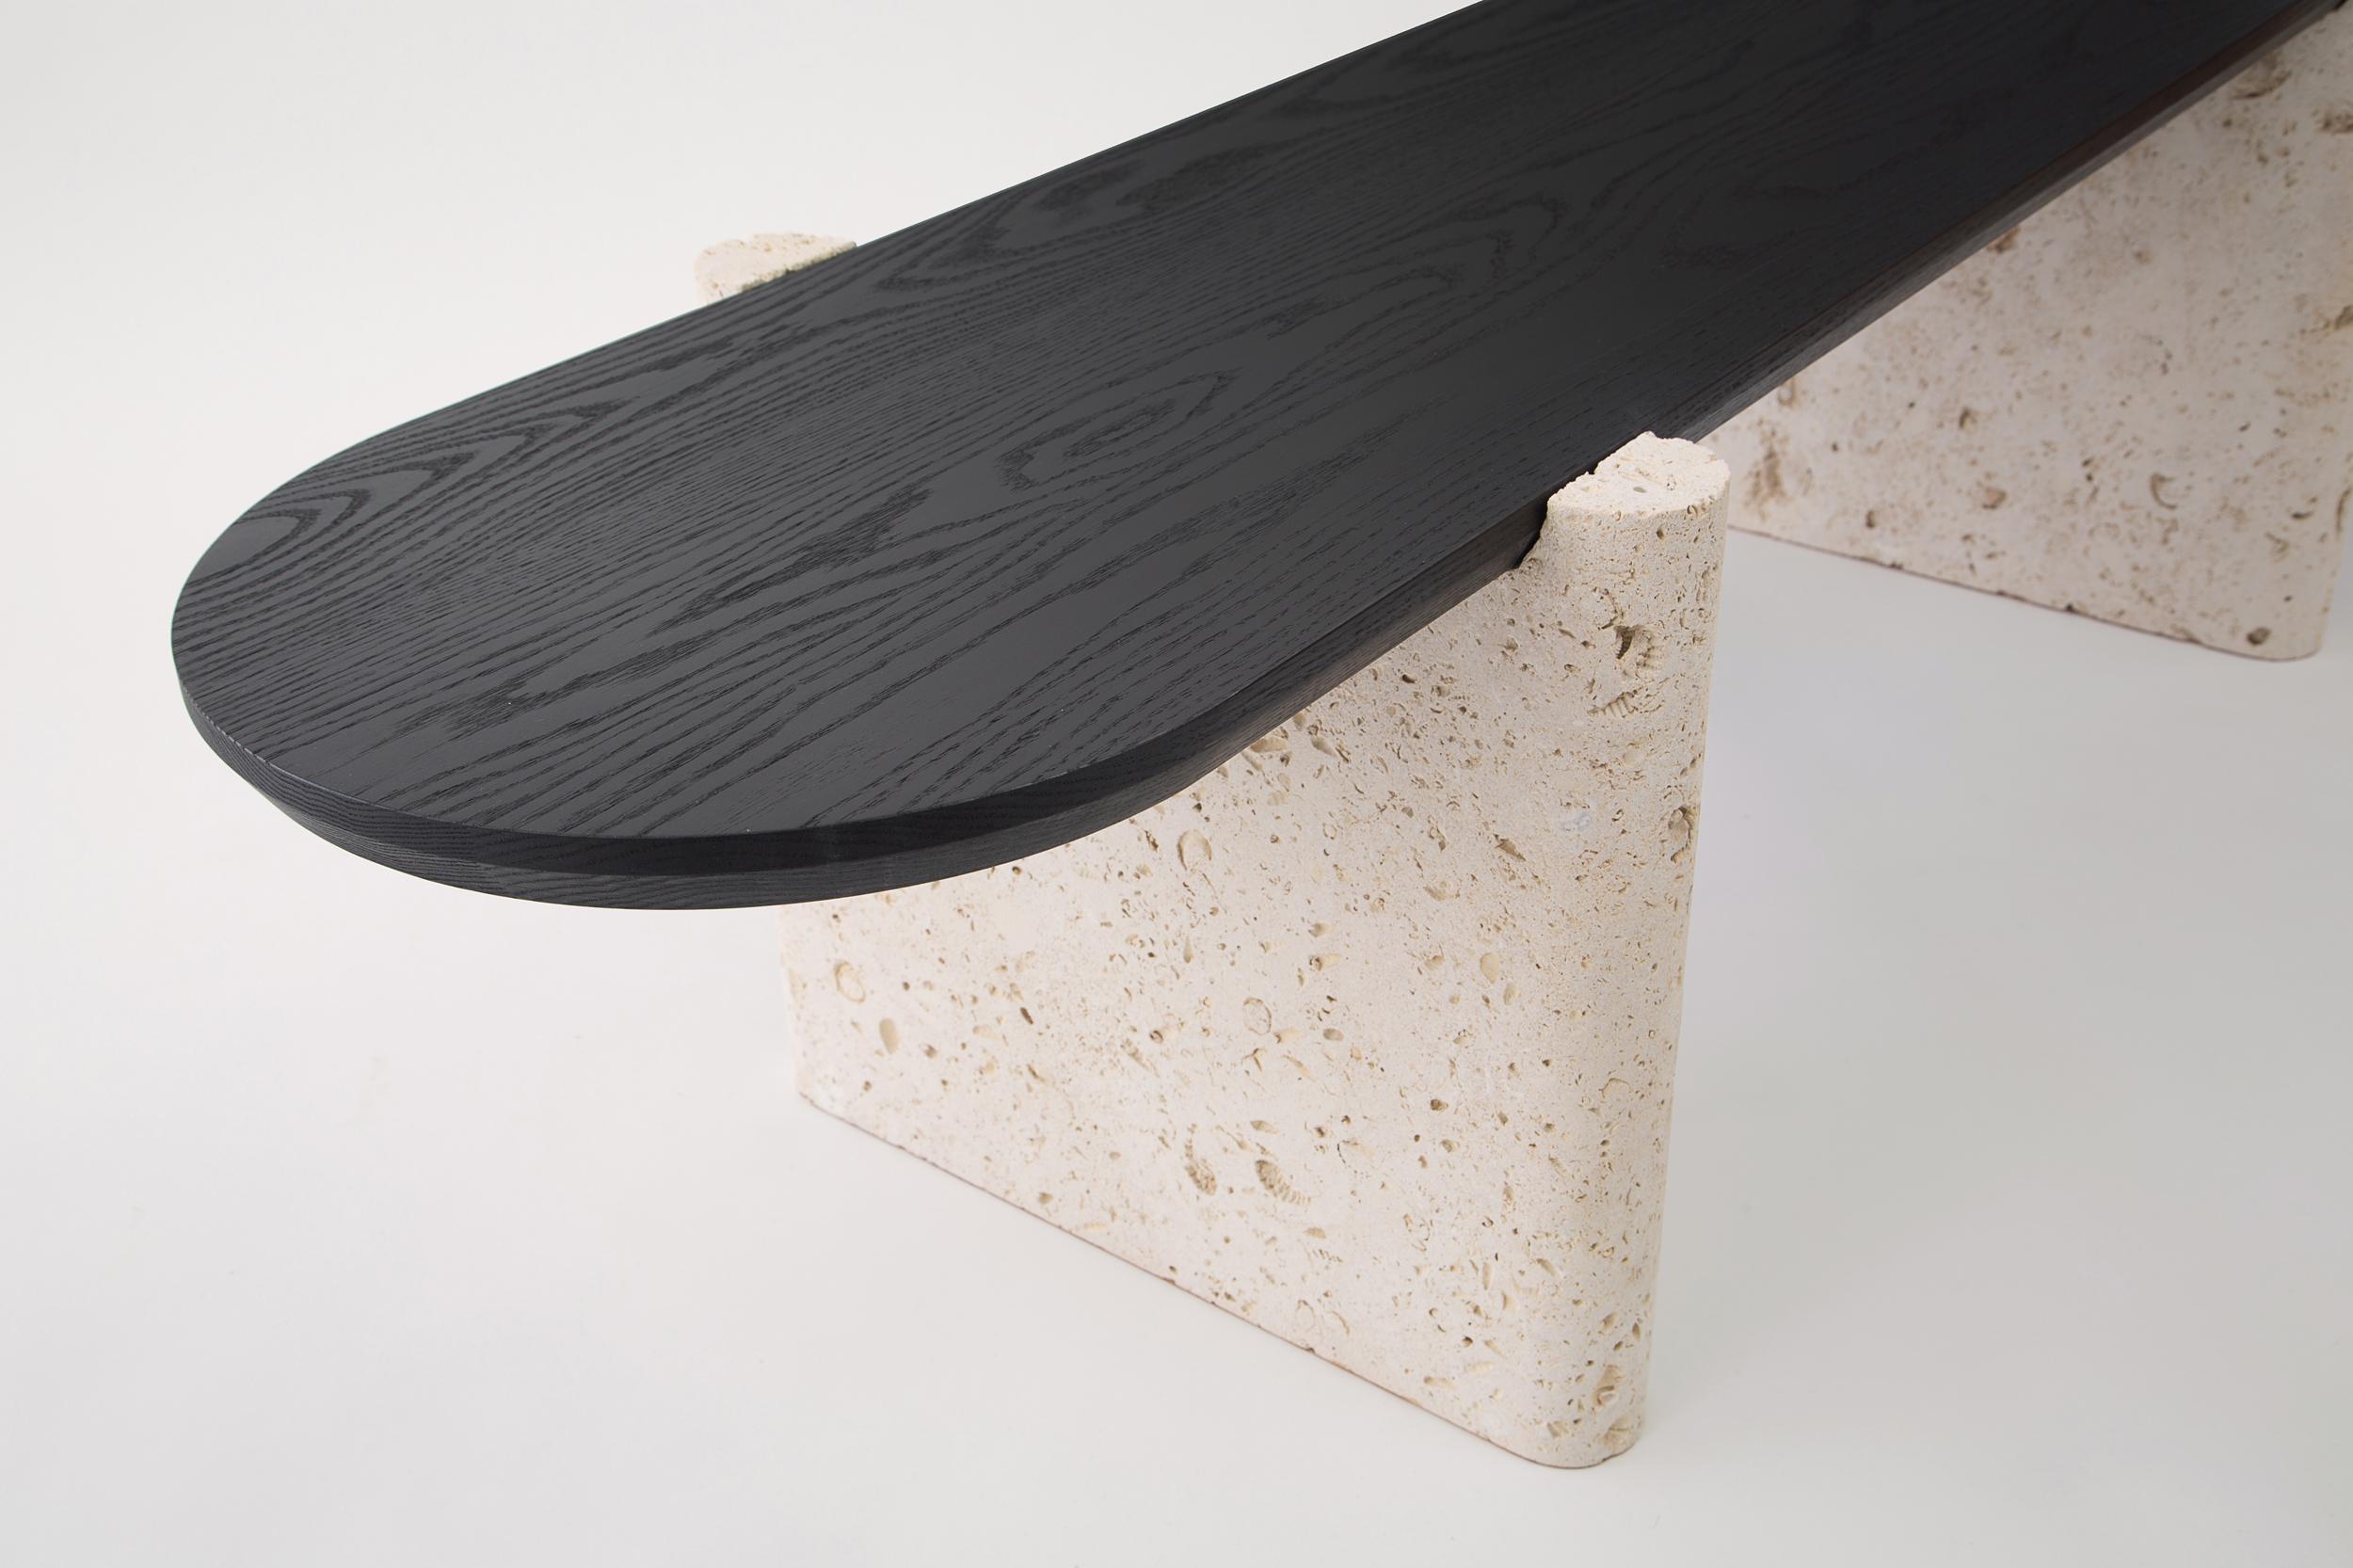 YUCCASTUFF_LAVACA TABLE_VIEW 009.jpg